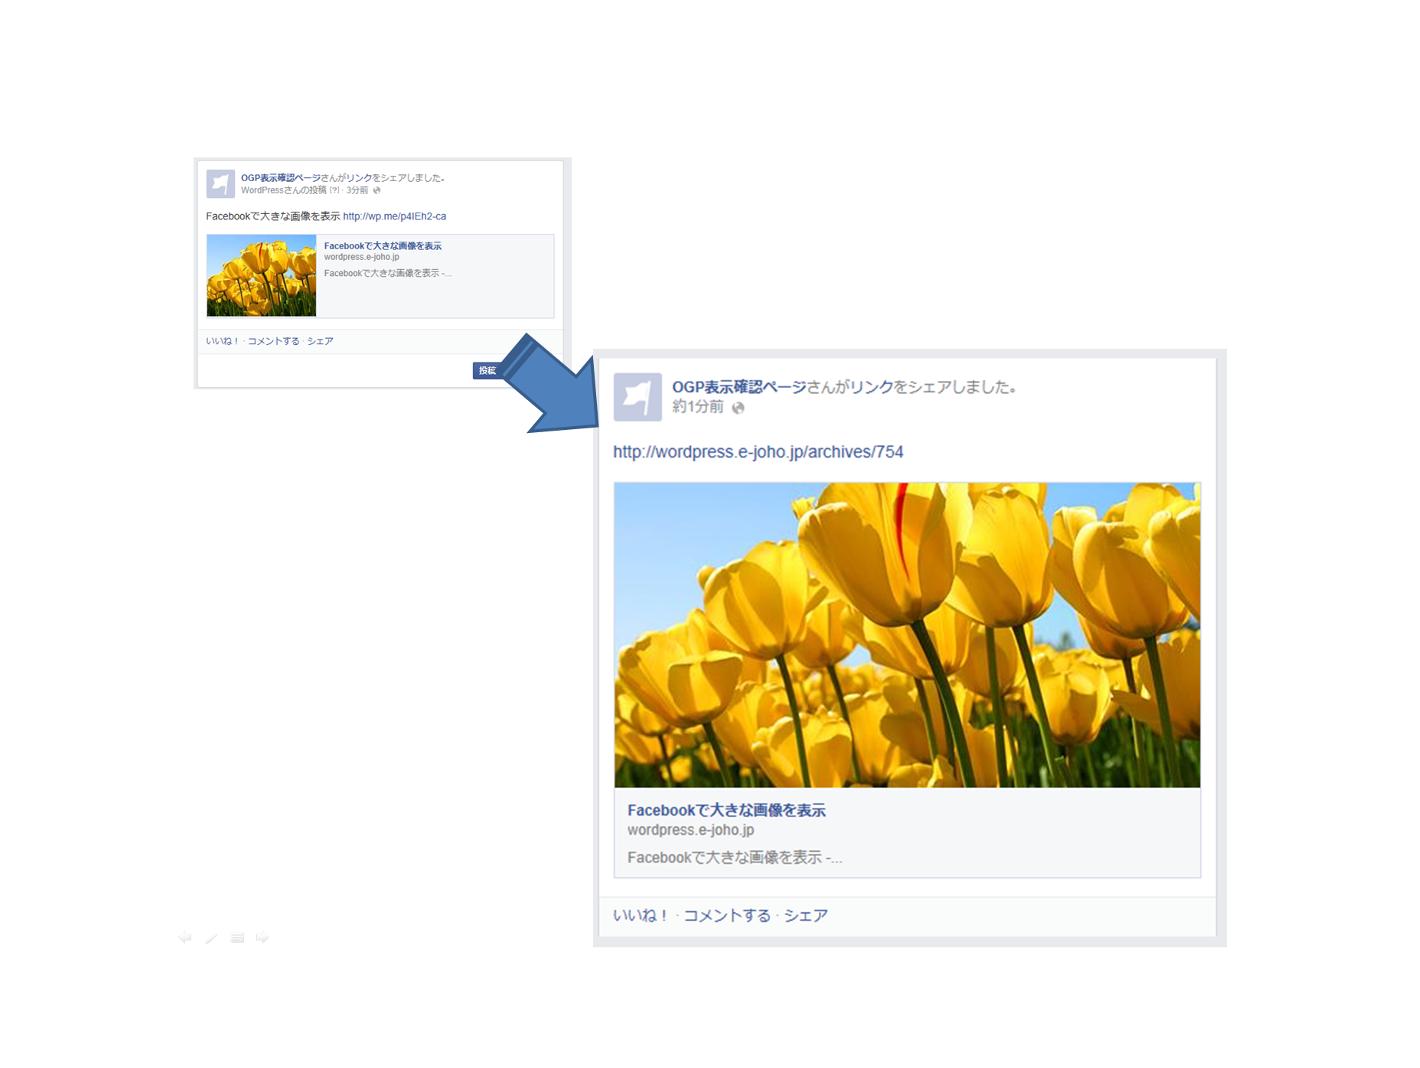 Facebookで画像を大きく表示させる解像度とは